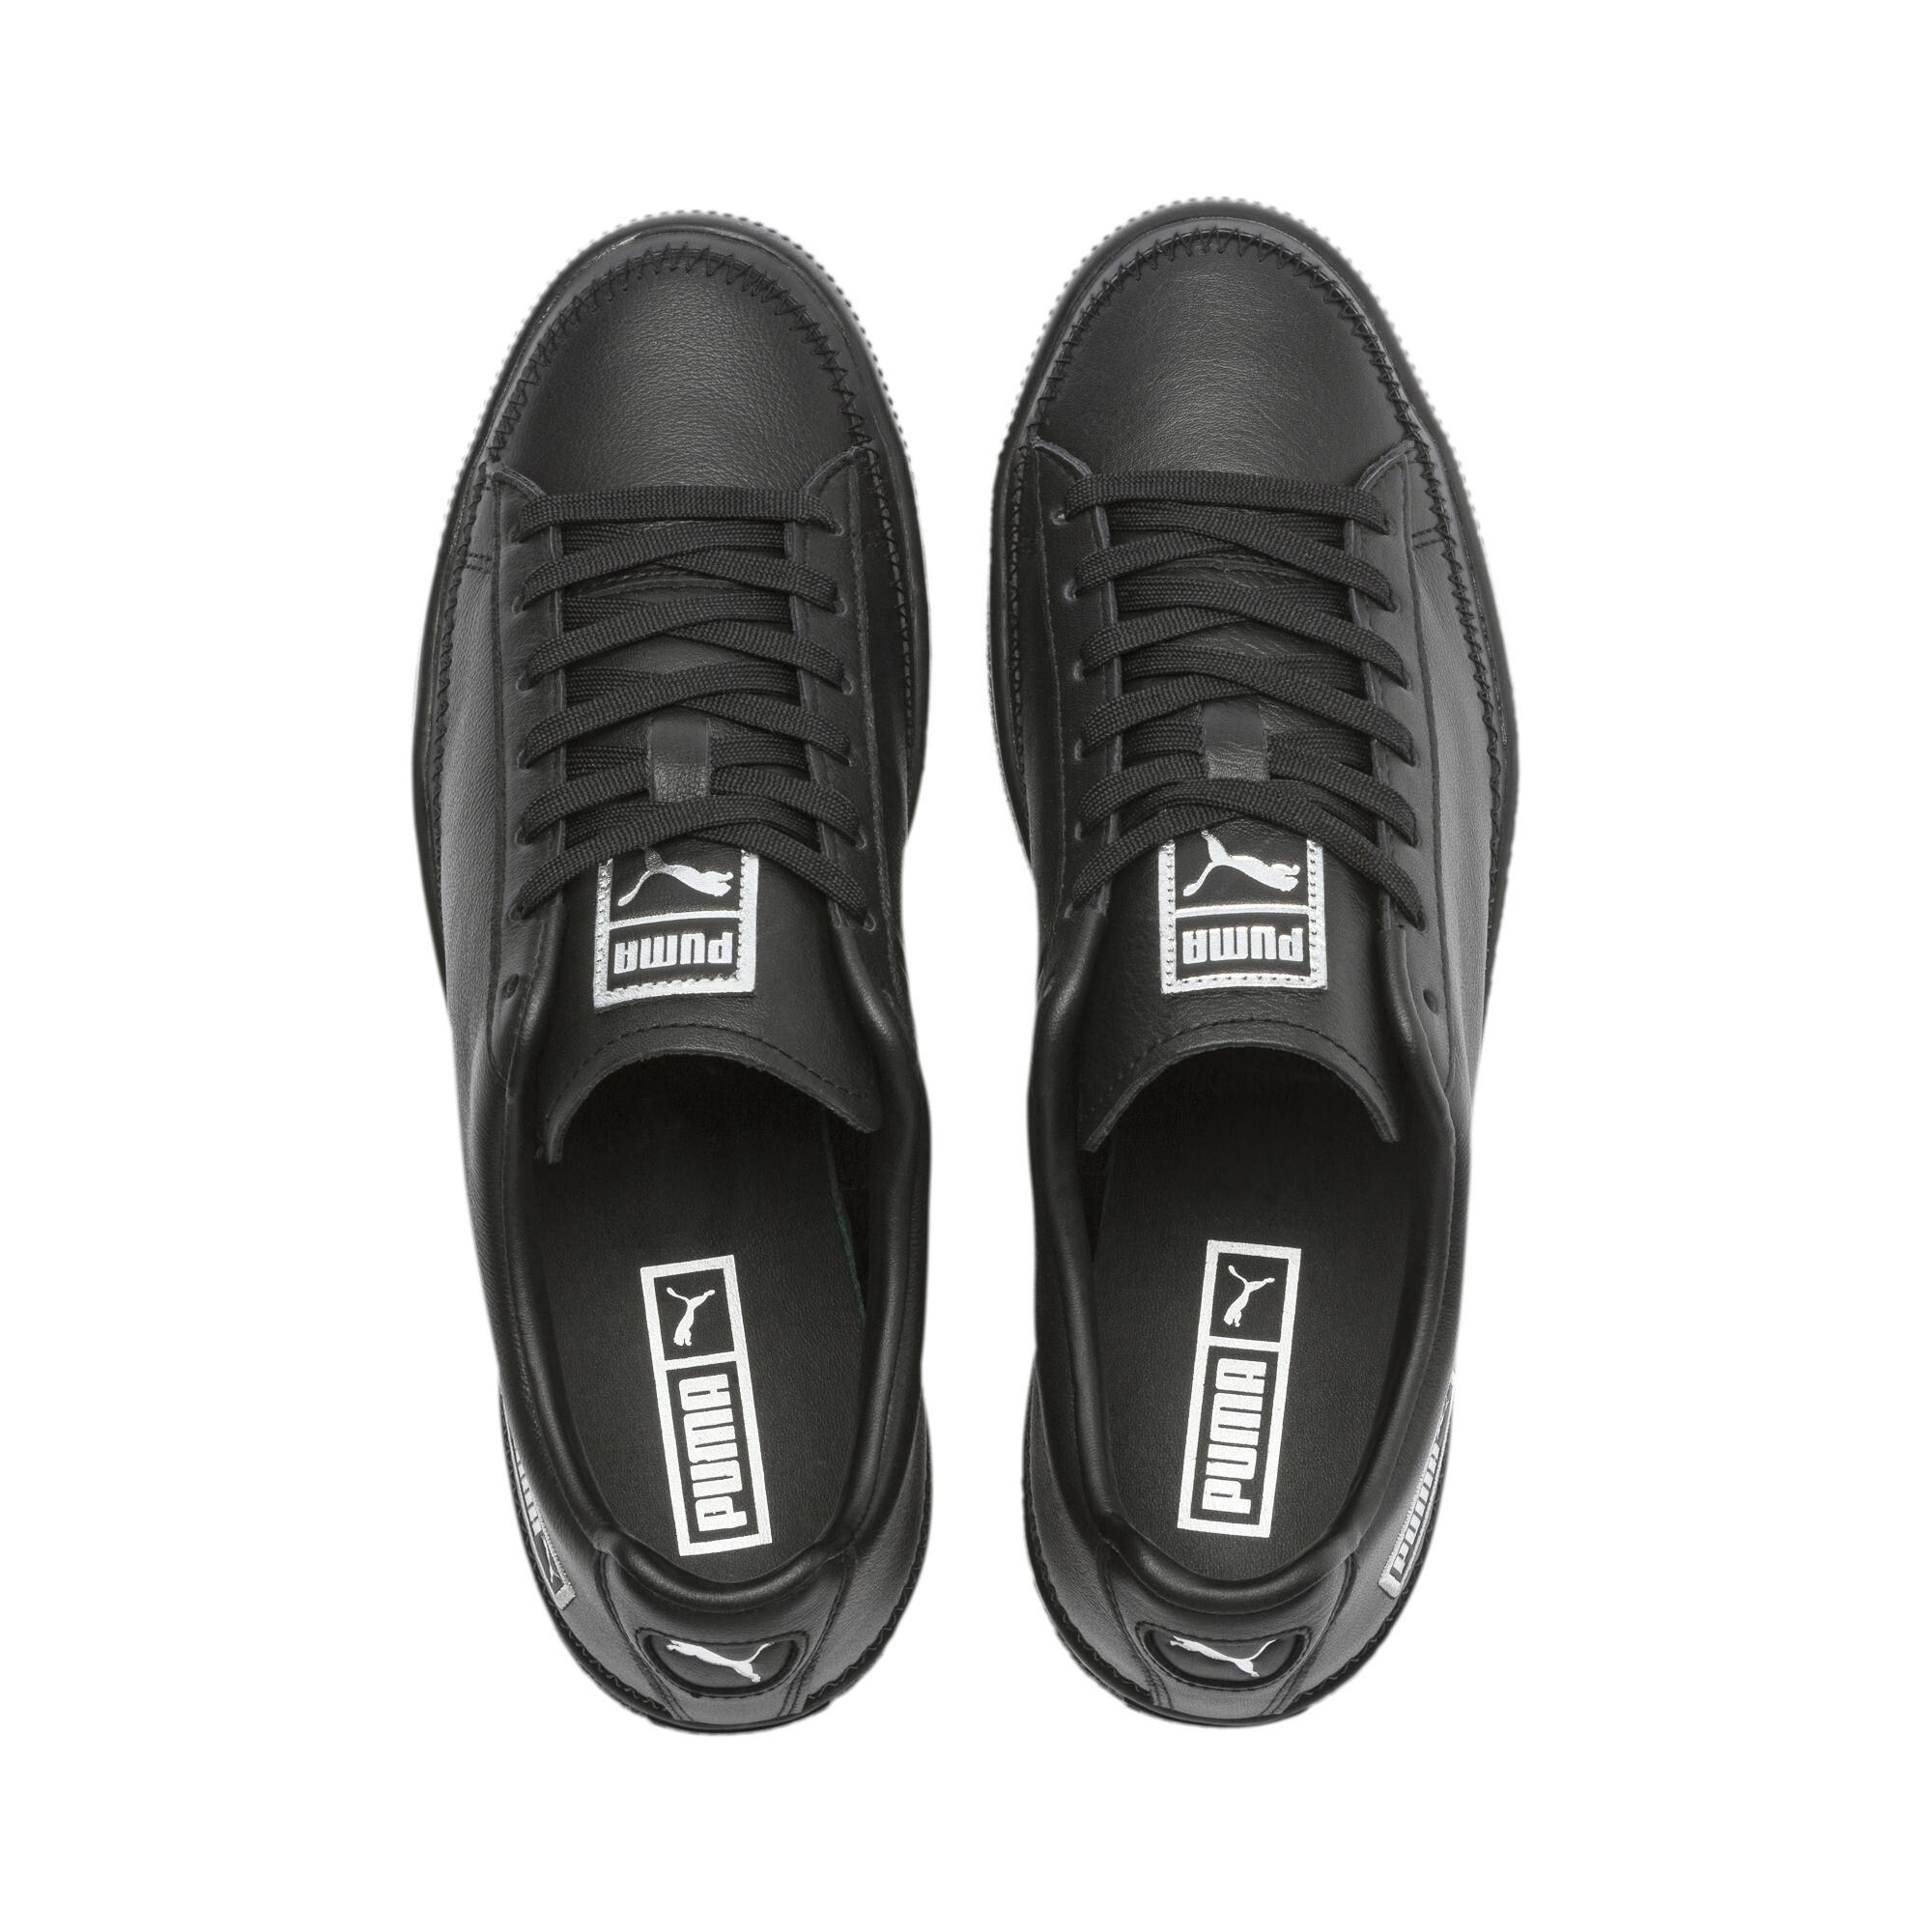 Indexbild 13 - PUMA Basket Stitch Sneaker Unisex Schuhe Neu